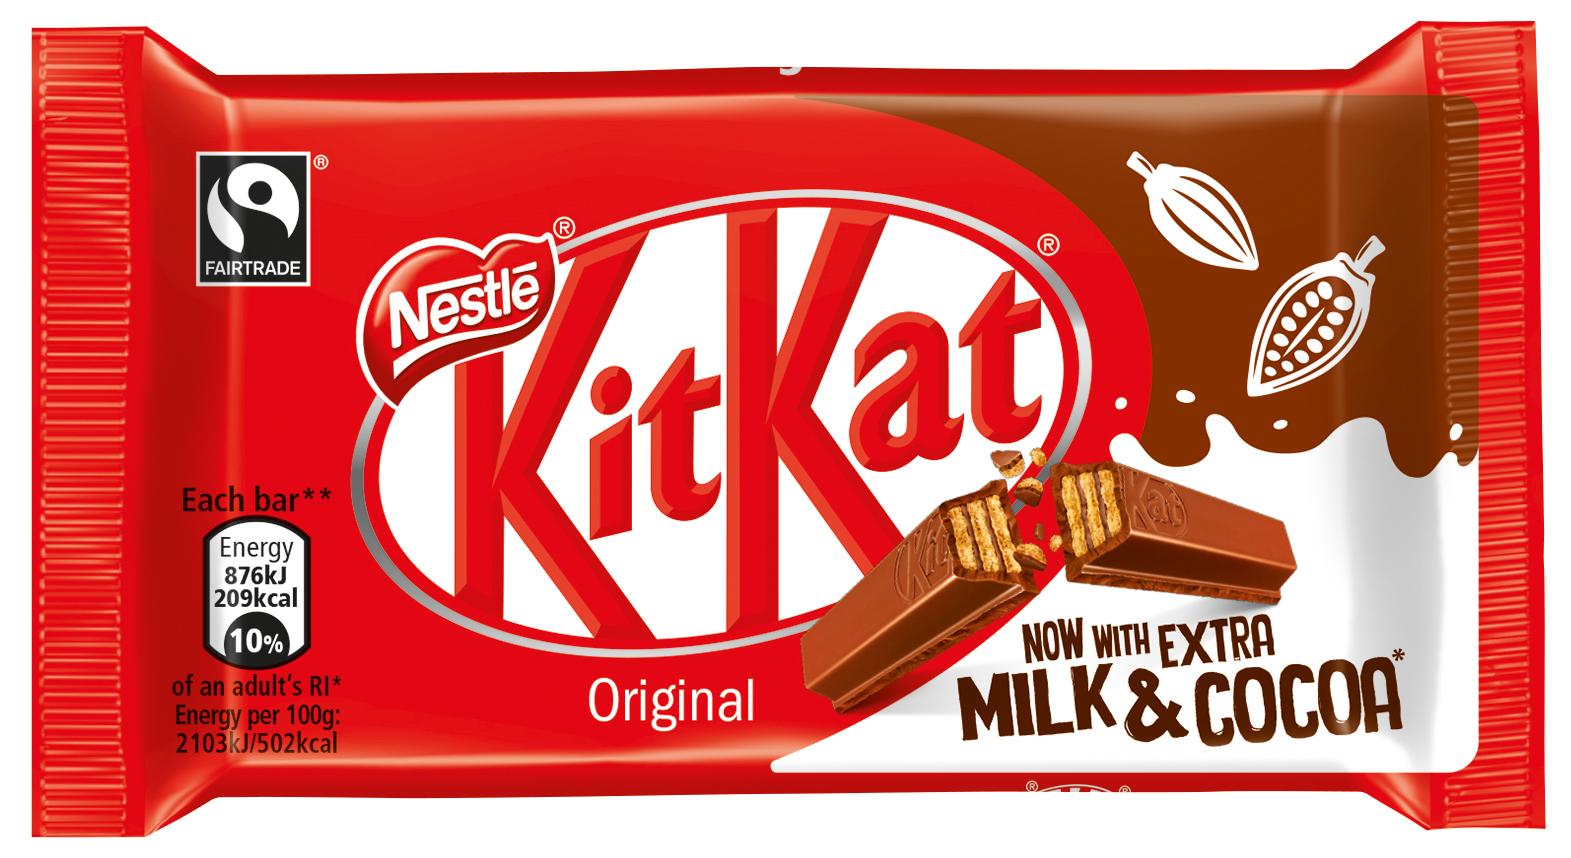 Kit Kat Launches Low Sugar Recipe